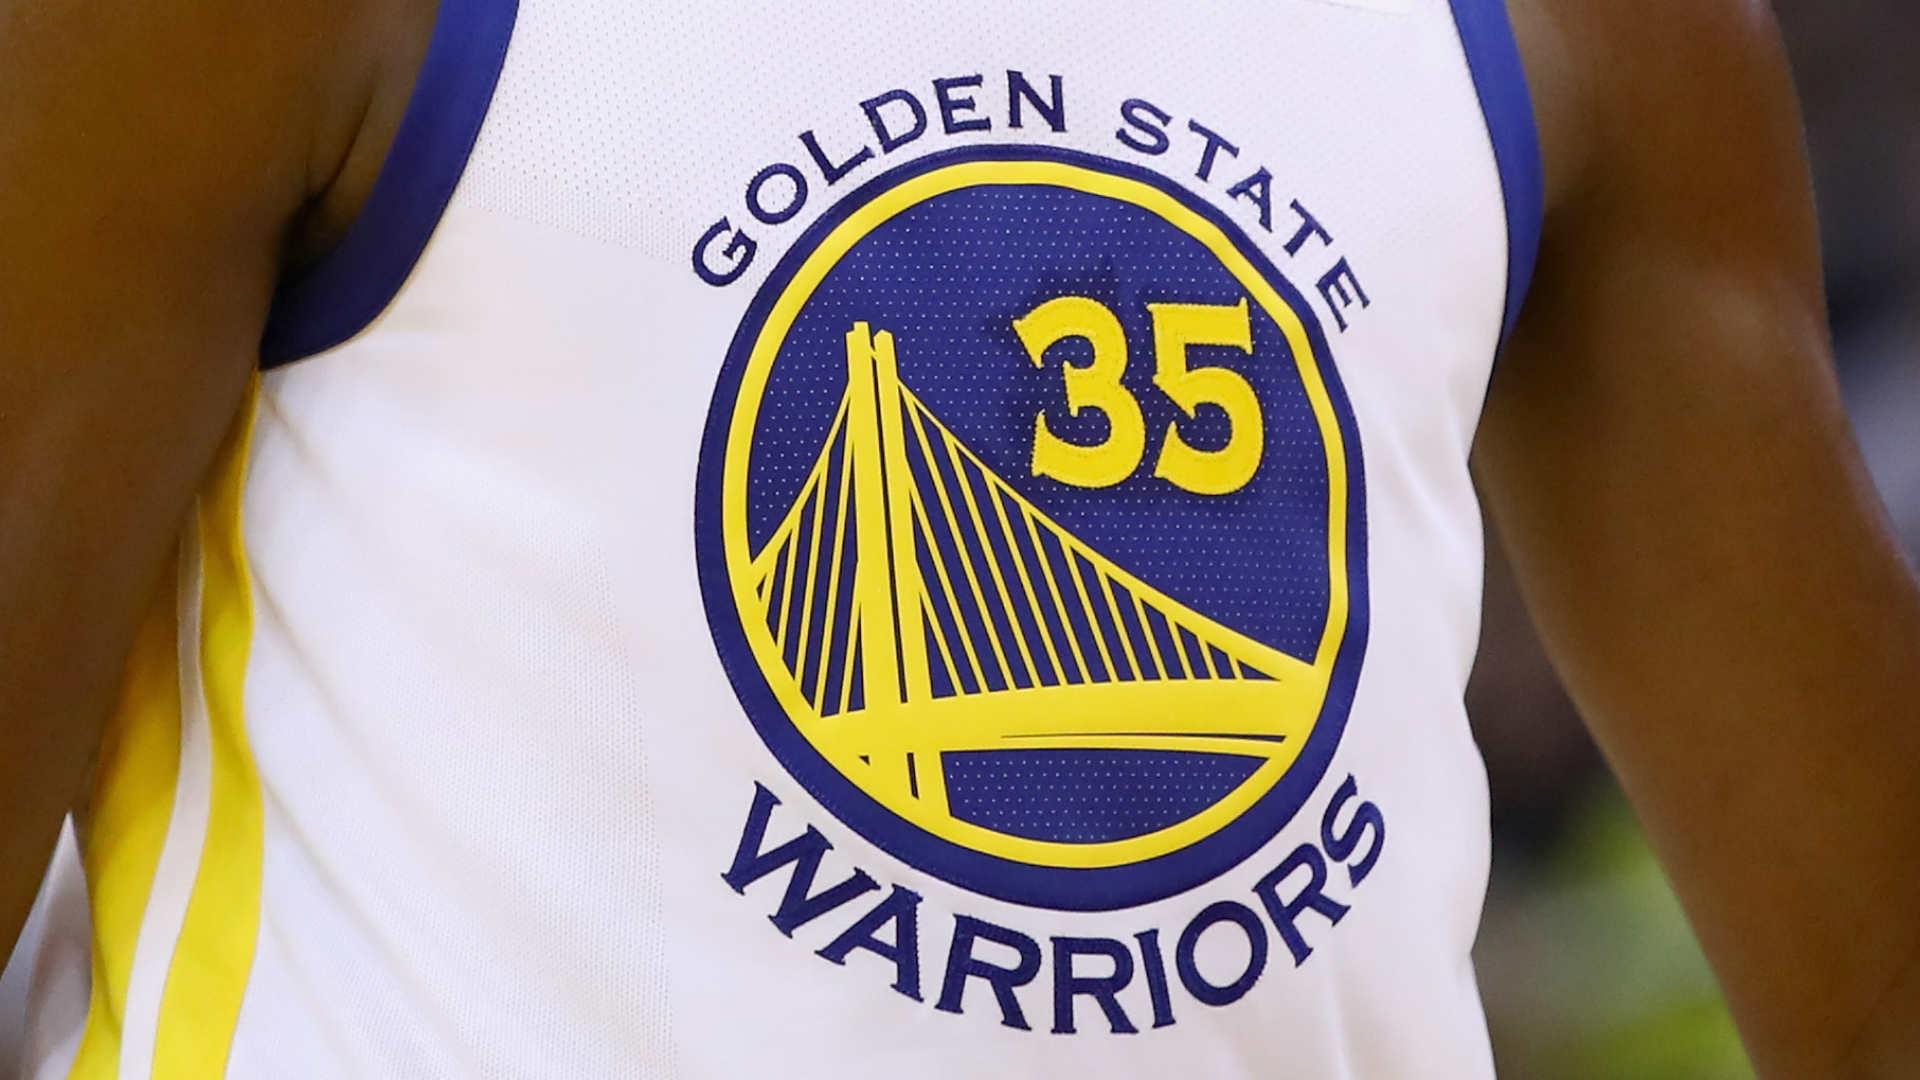 Warriors-logo_6k2u9pnpmh1r15aotbwkrt2aa